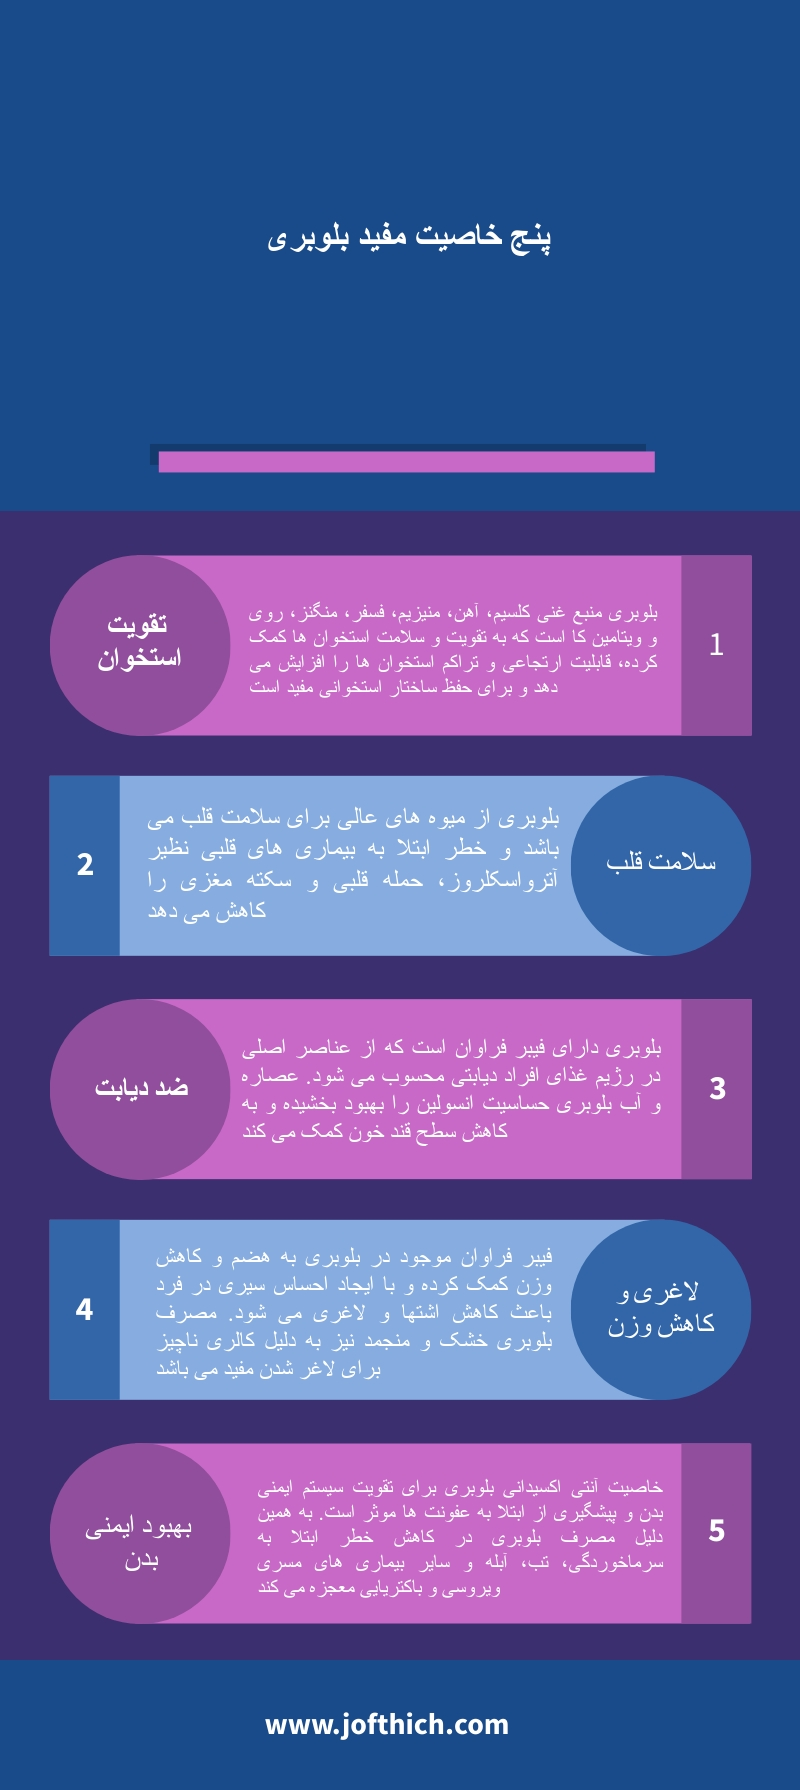 پنج خاصیت مفید بلوبری